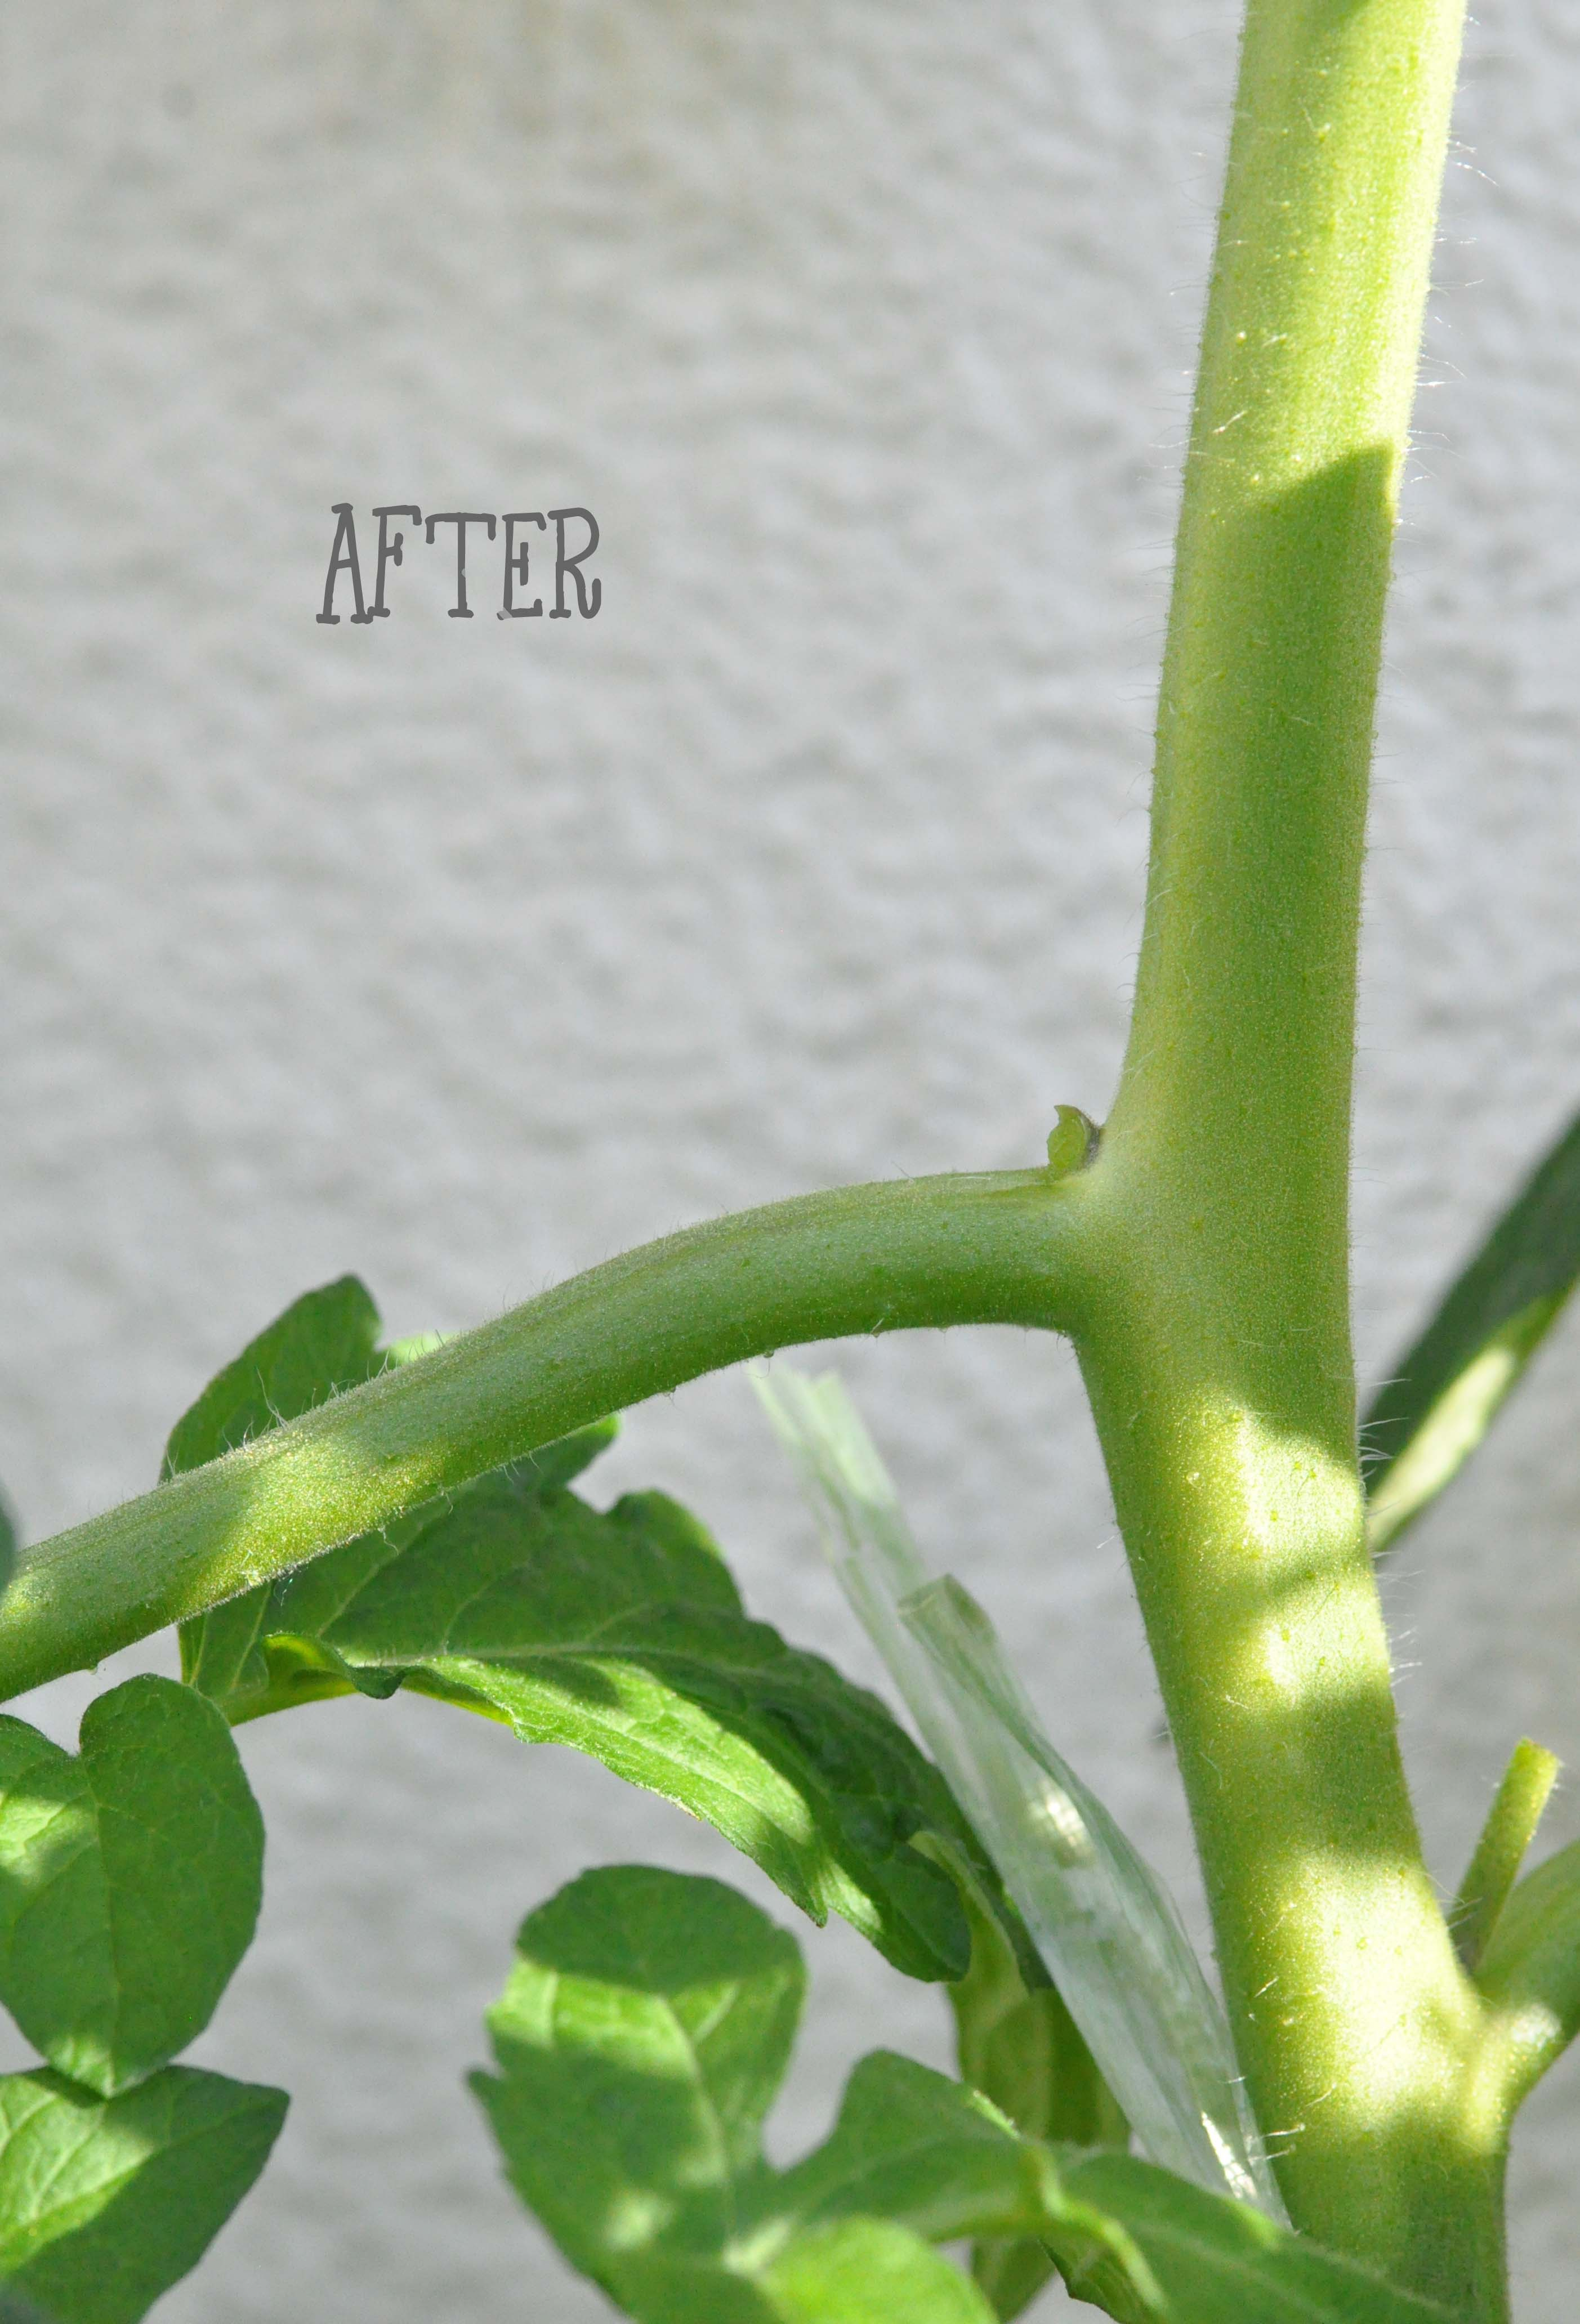 tomaten ausgegeizt_bearbeitet-2